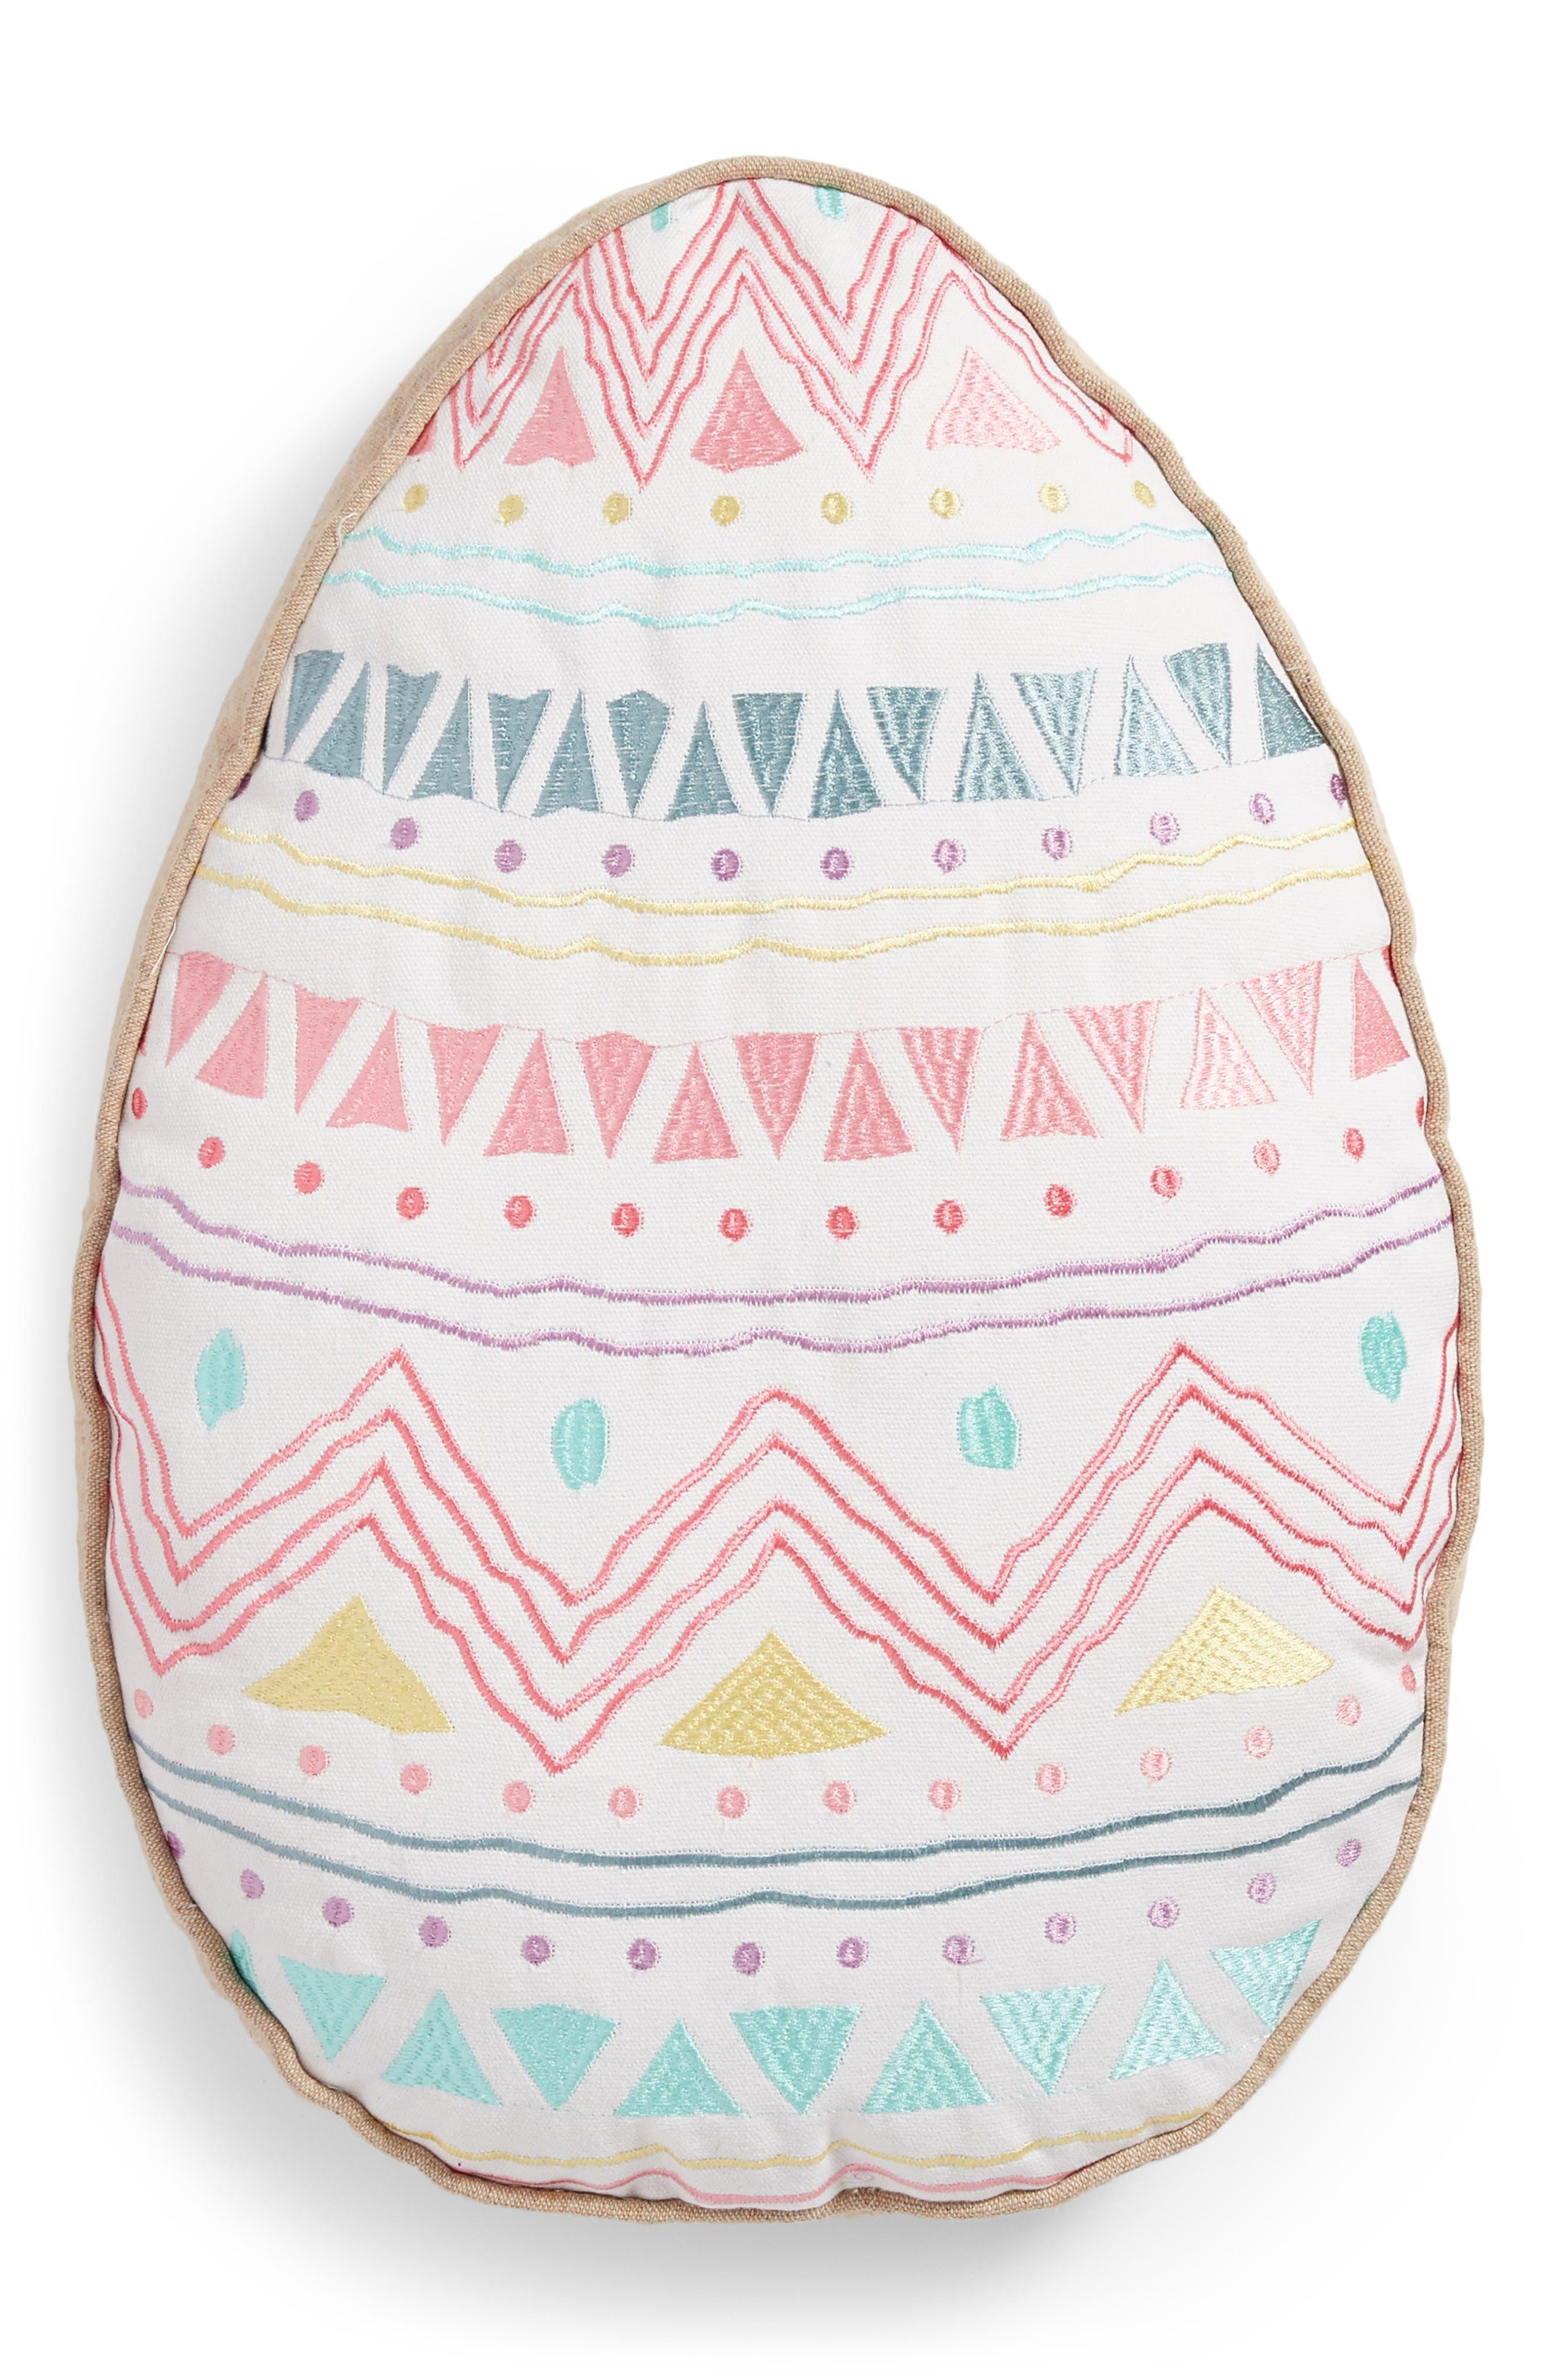 Egg Accent Pillow,                         Main,                         color, 100